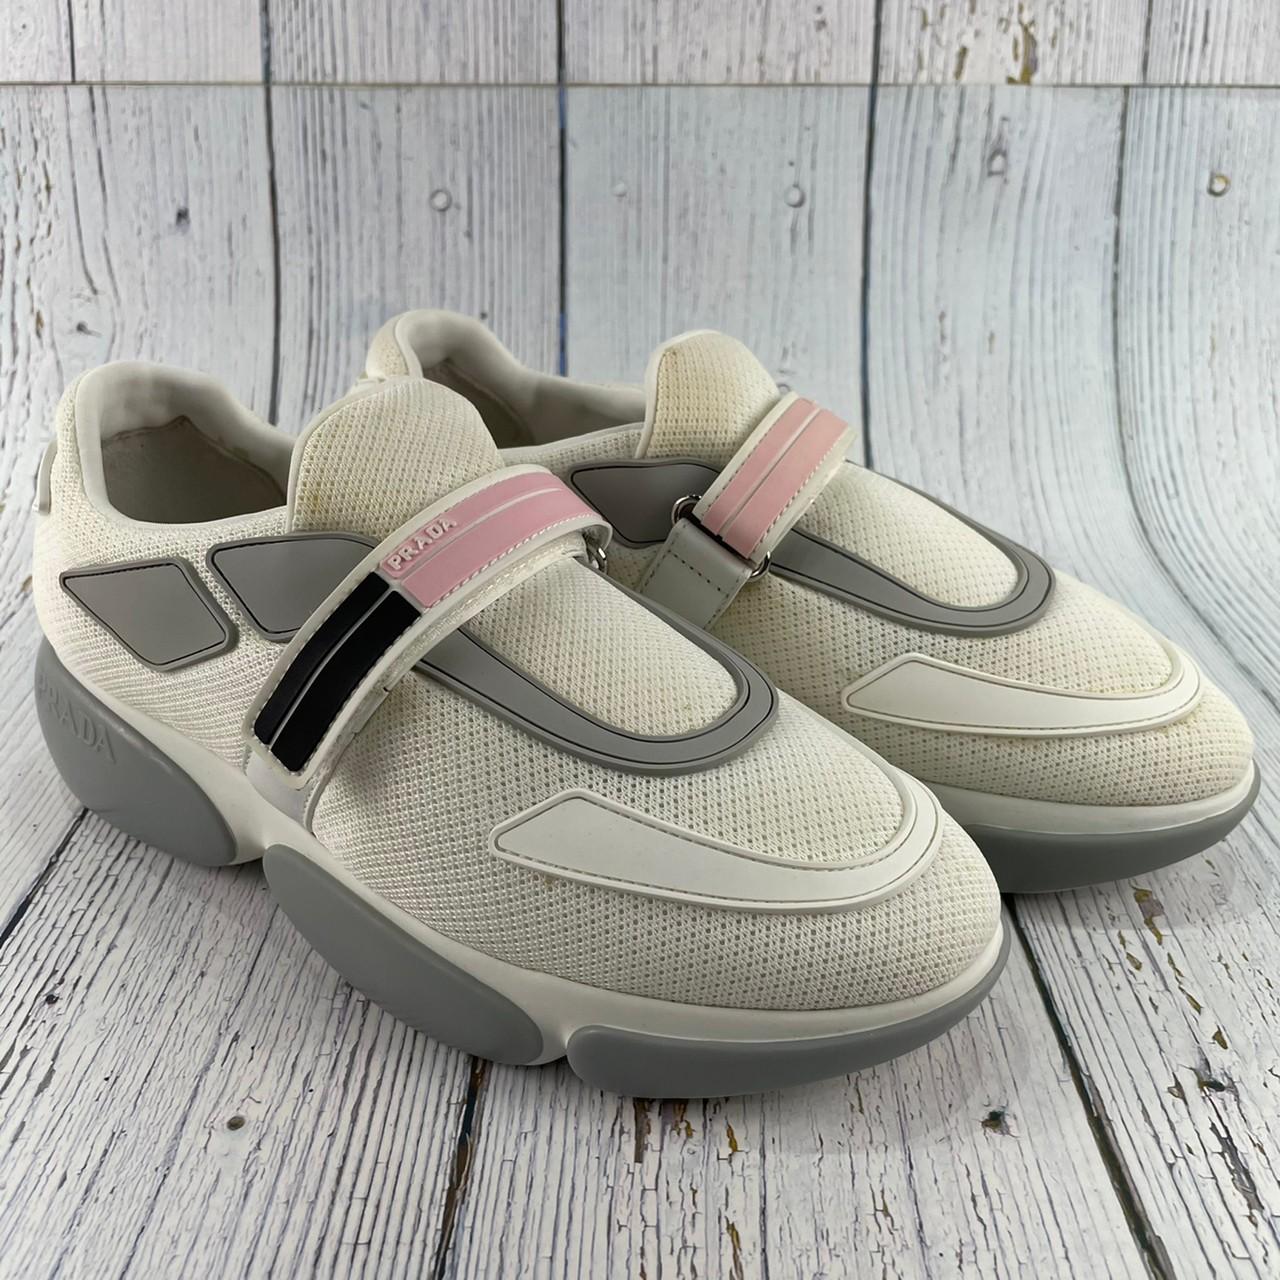 BRAND楓月 PRADA 1E293I 白色 織布 粉紅色LOGO 魔鬼氈 布鞋 運動鞋 休閒鞋 #36